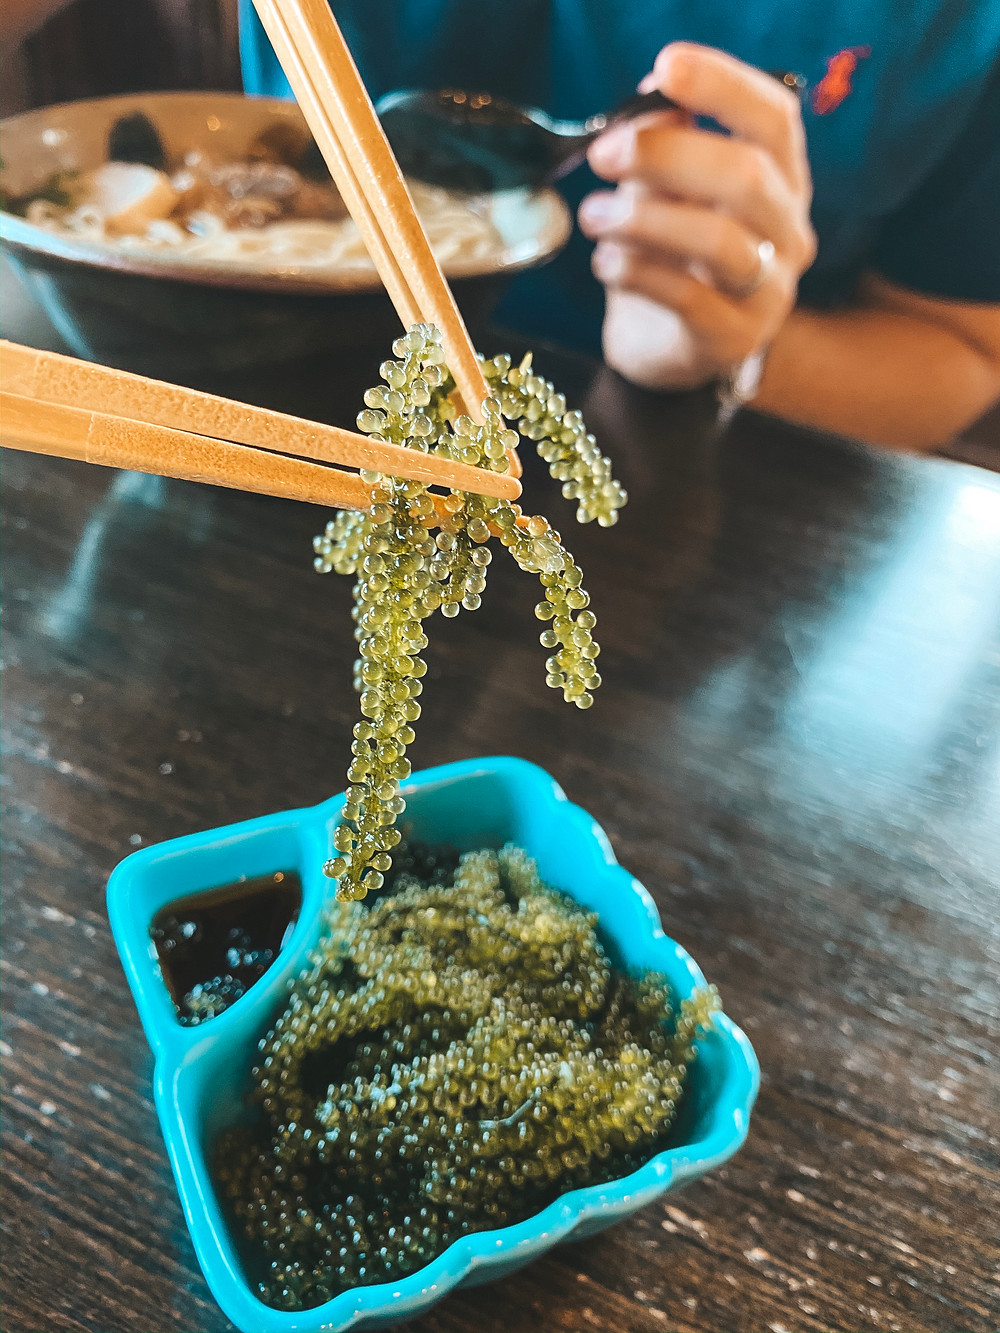 Okinawa Sea Grapes